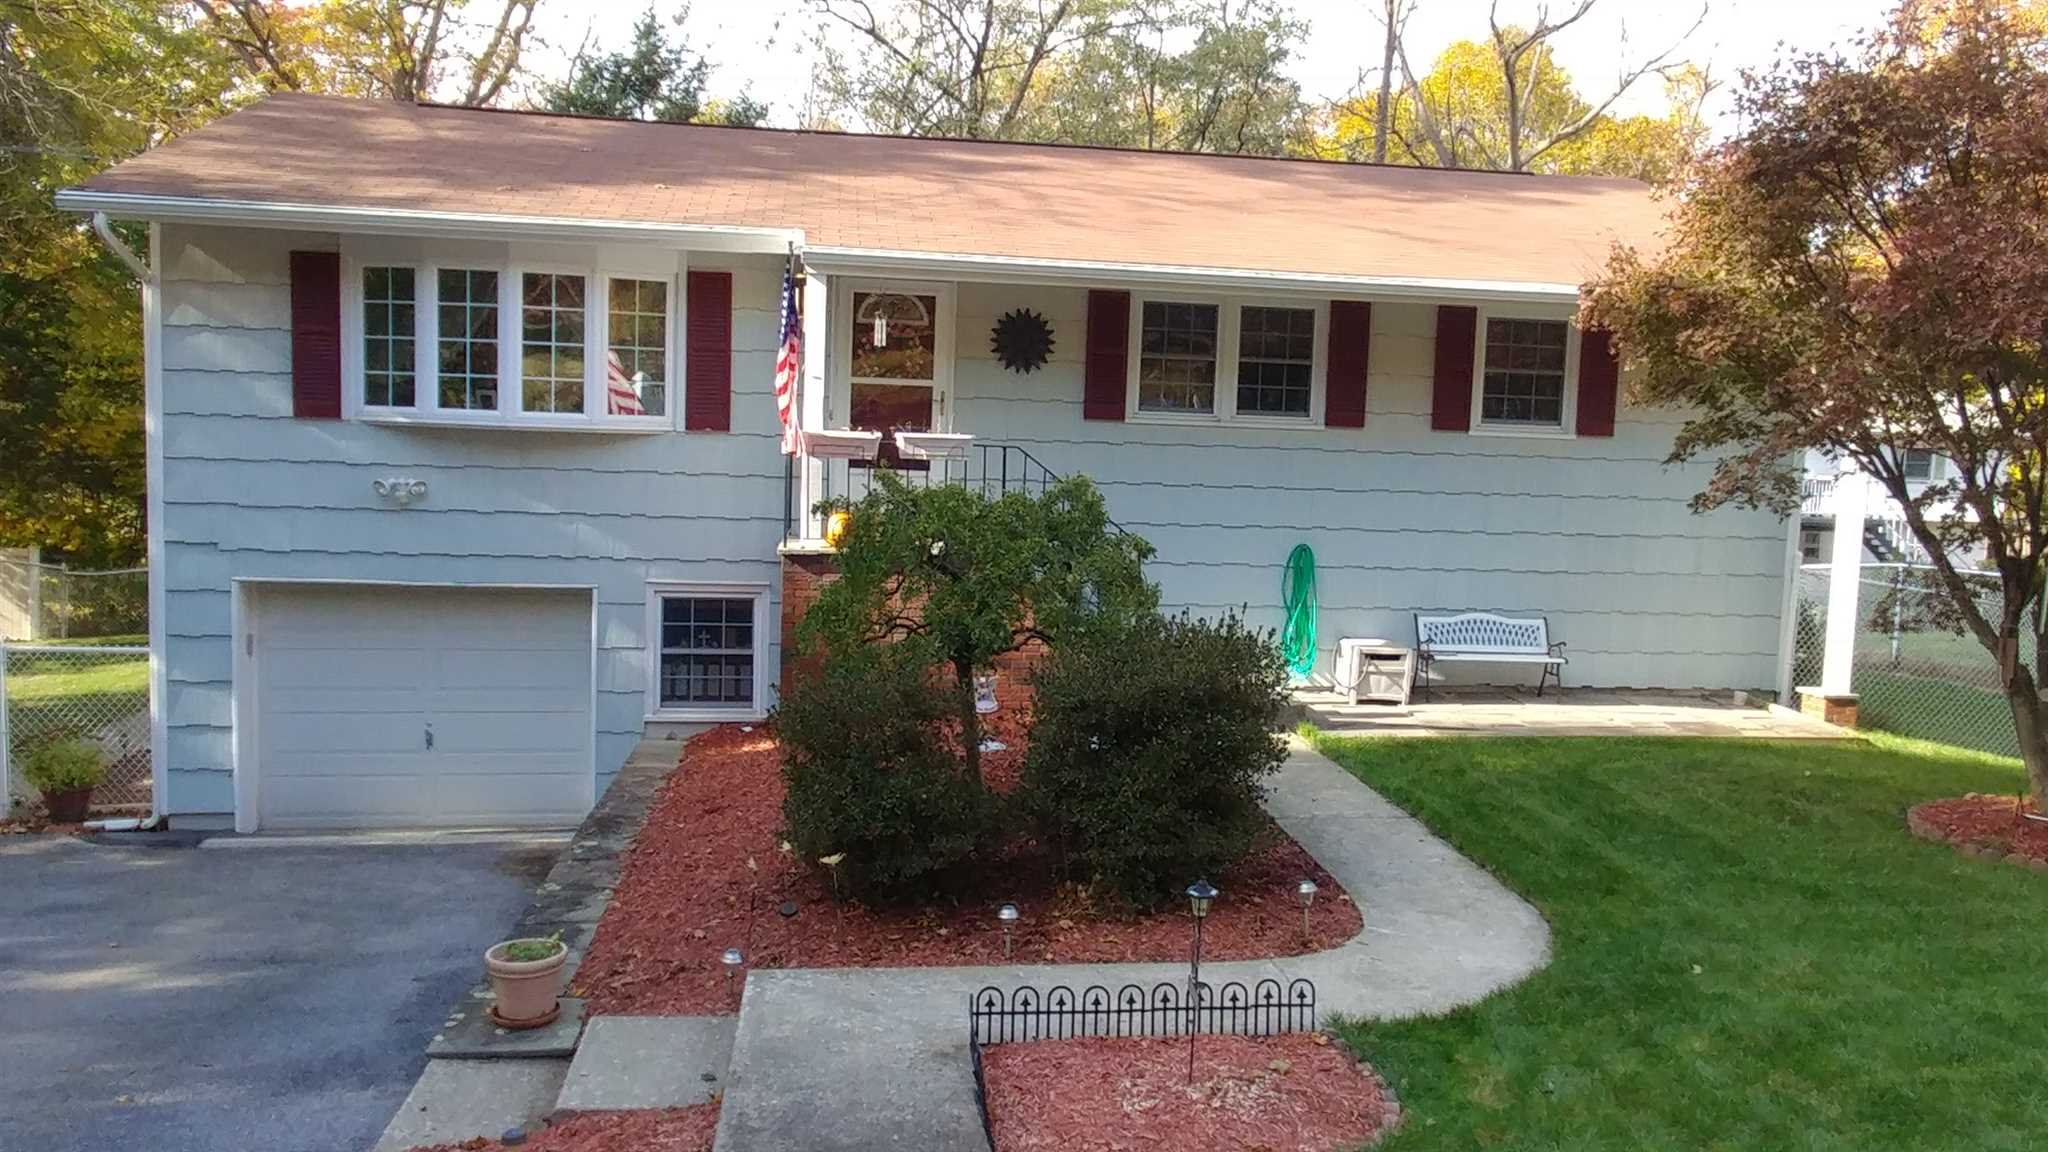 Single Family Home for Sale at 400 WASHINGTON Avenue 400 WASHINGTON Avenue Beacon, New York 12508 United States